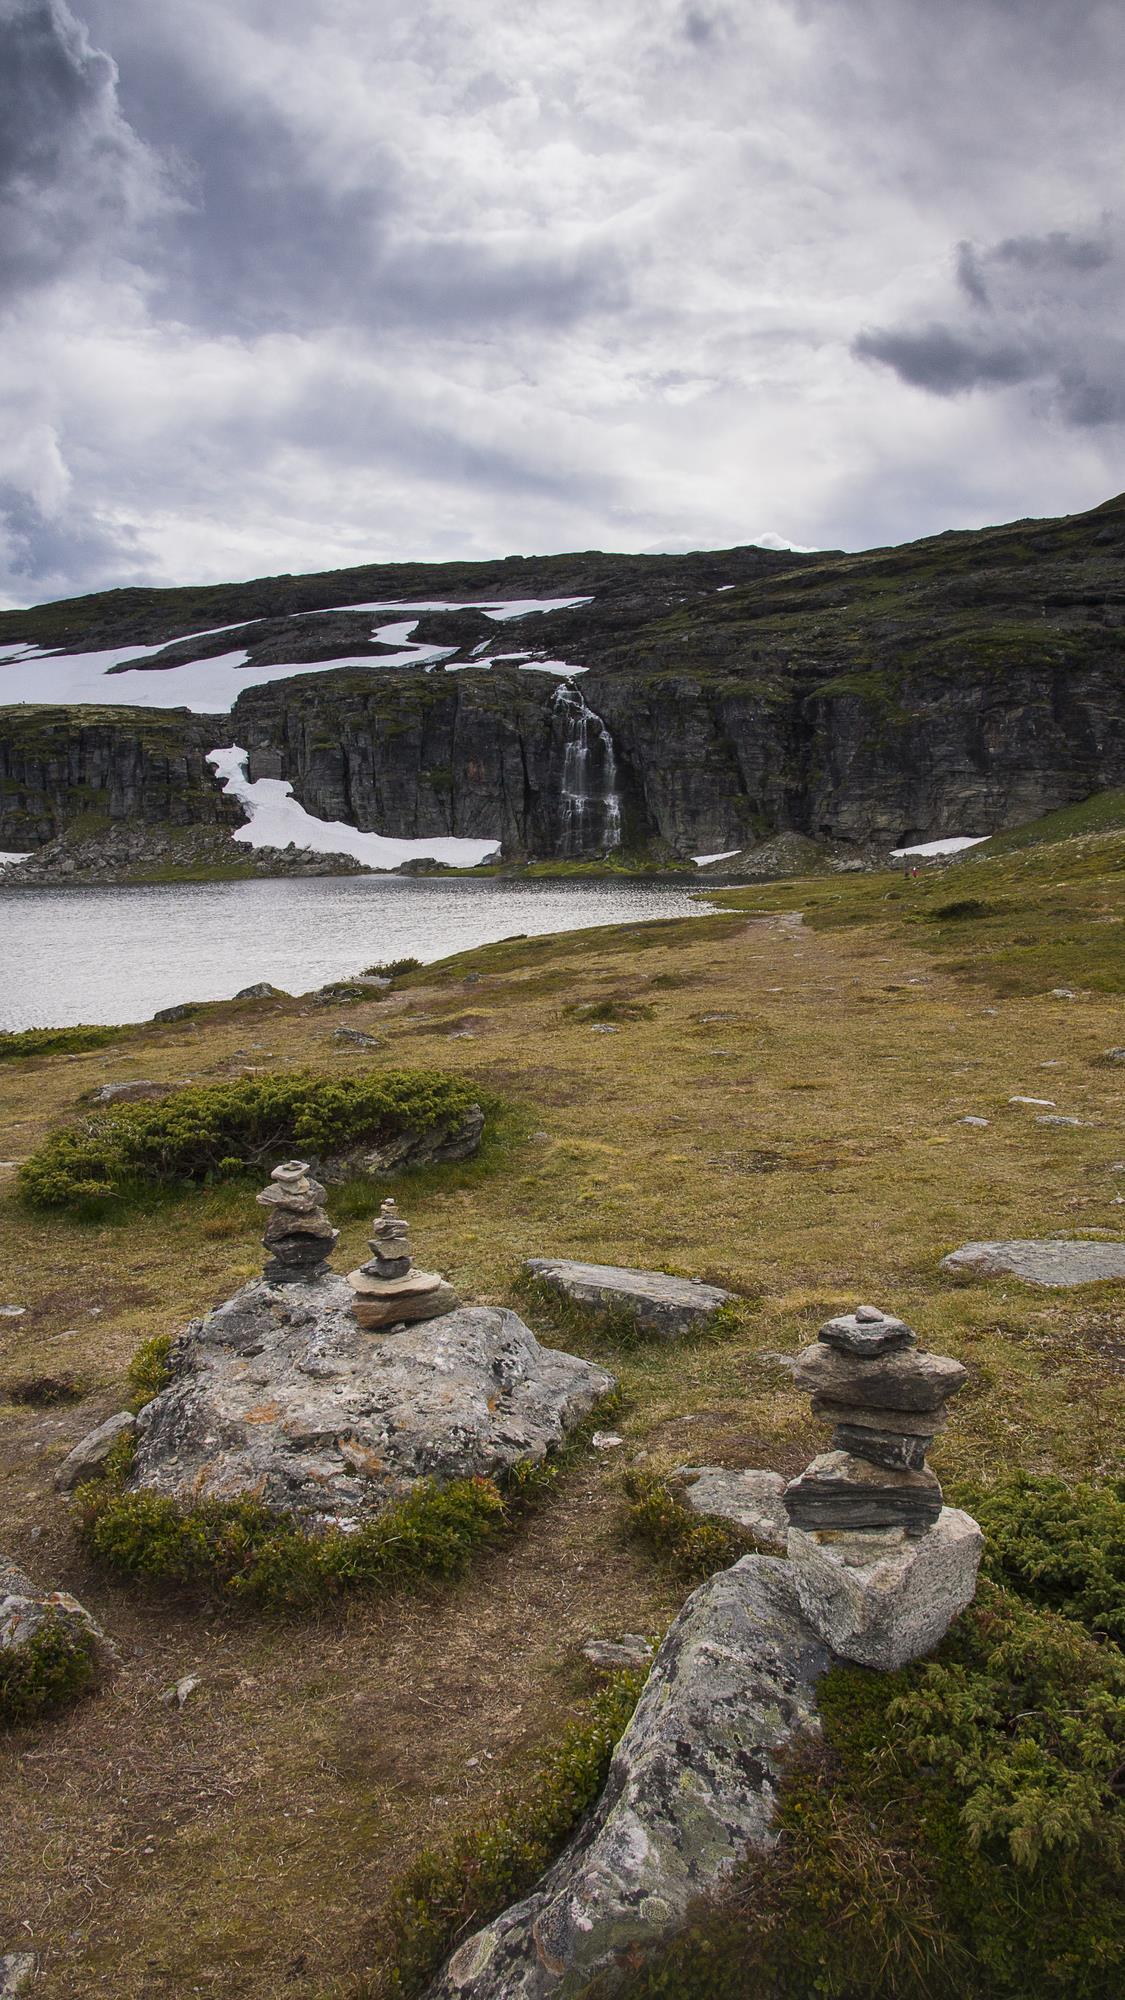 Aurlandsfjellet - Droga Śnieżna, Norwegia